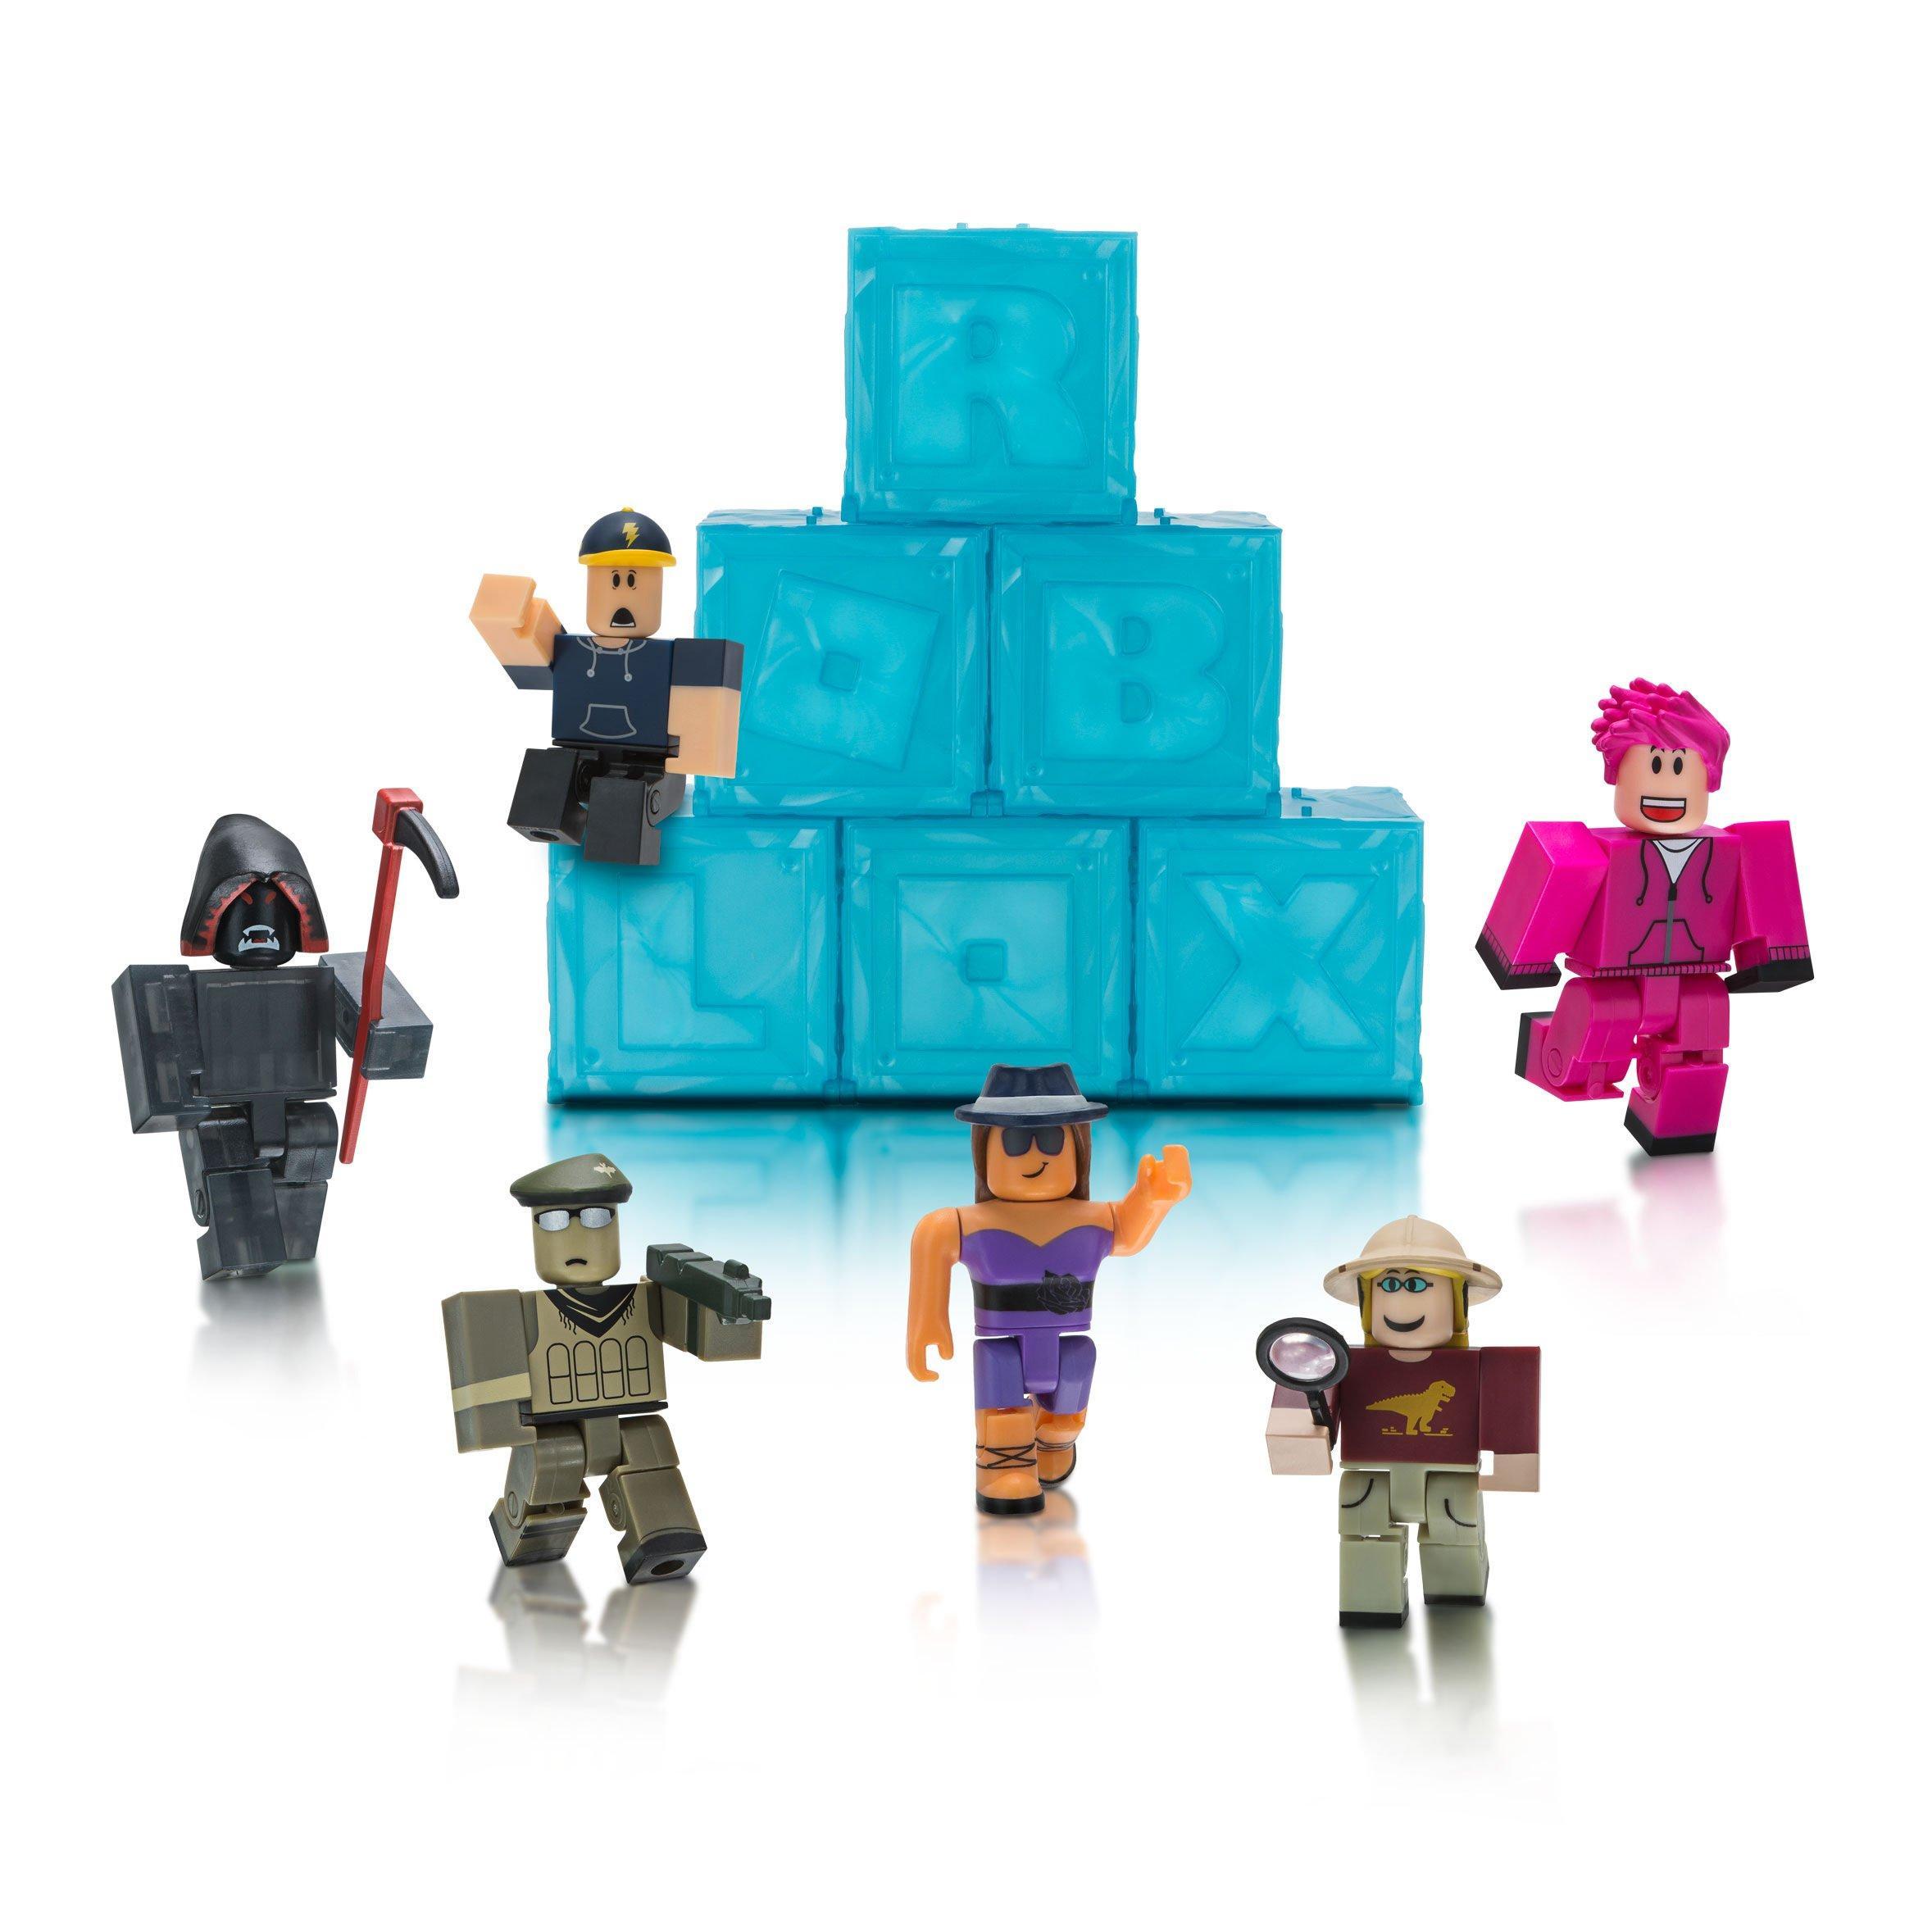 Roblox Series 3 Blind Box Figures Gamestop